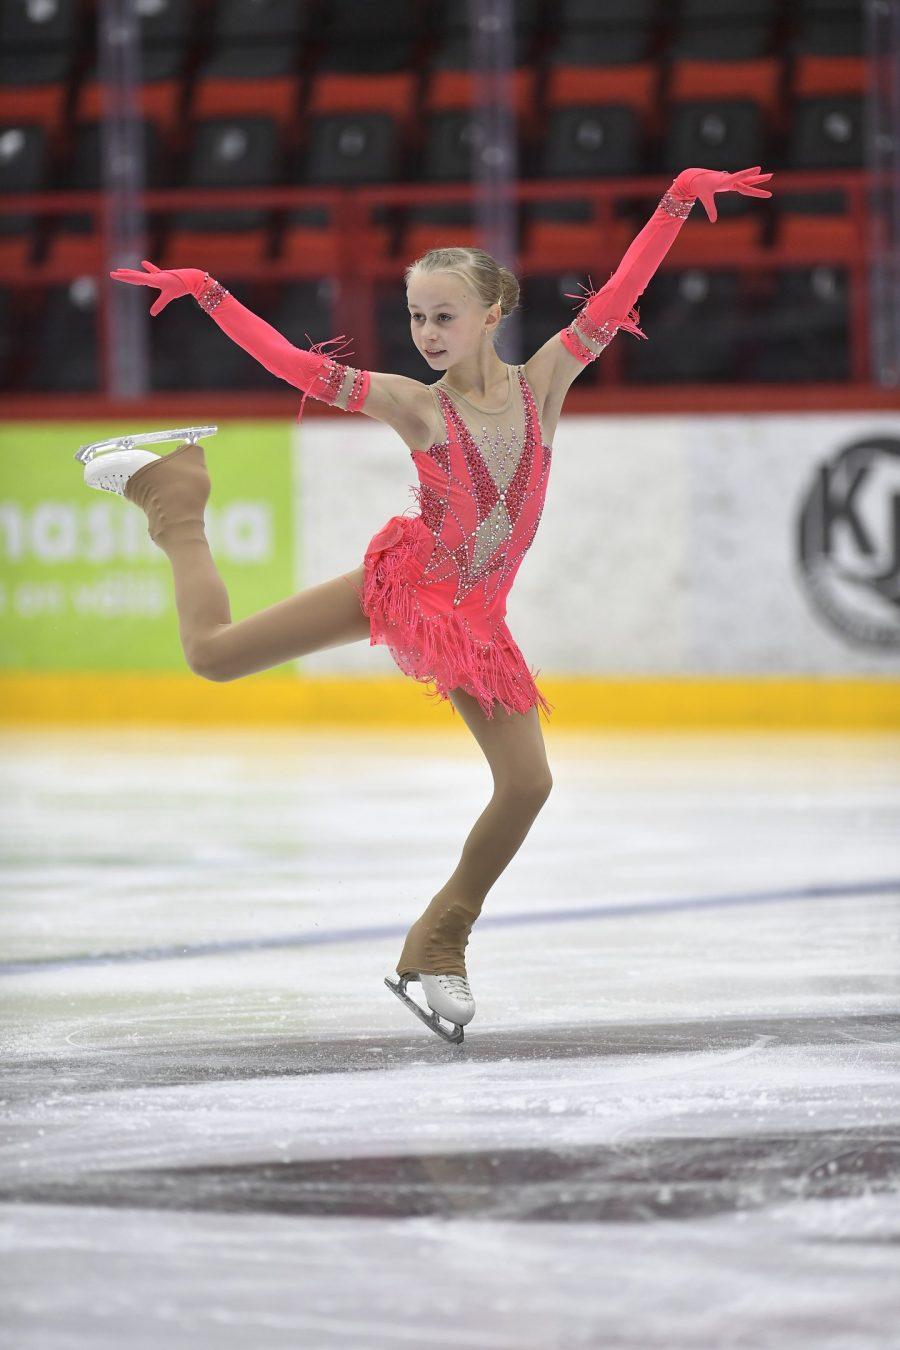 Janna Jyrkinen